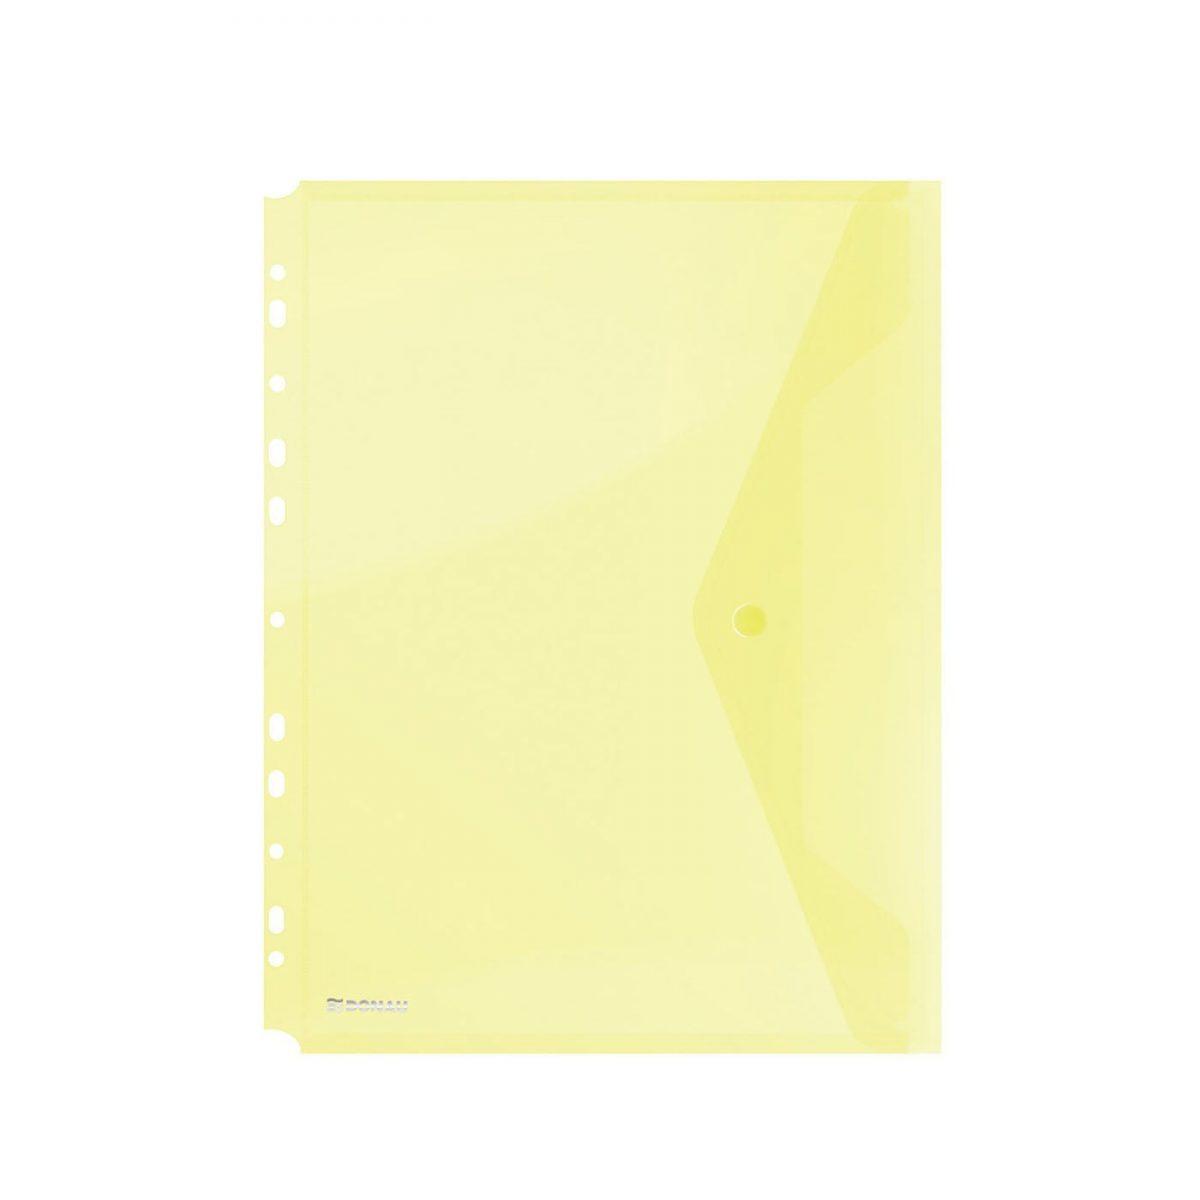 Folie protectie doc. A4 portret, inchidere cu capsa, 4/set, 200 microni, DONAU - galben transparent